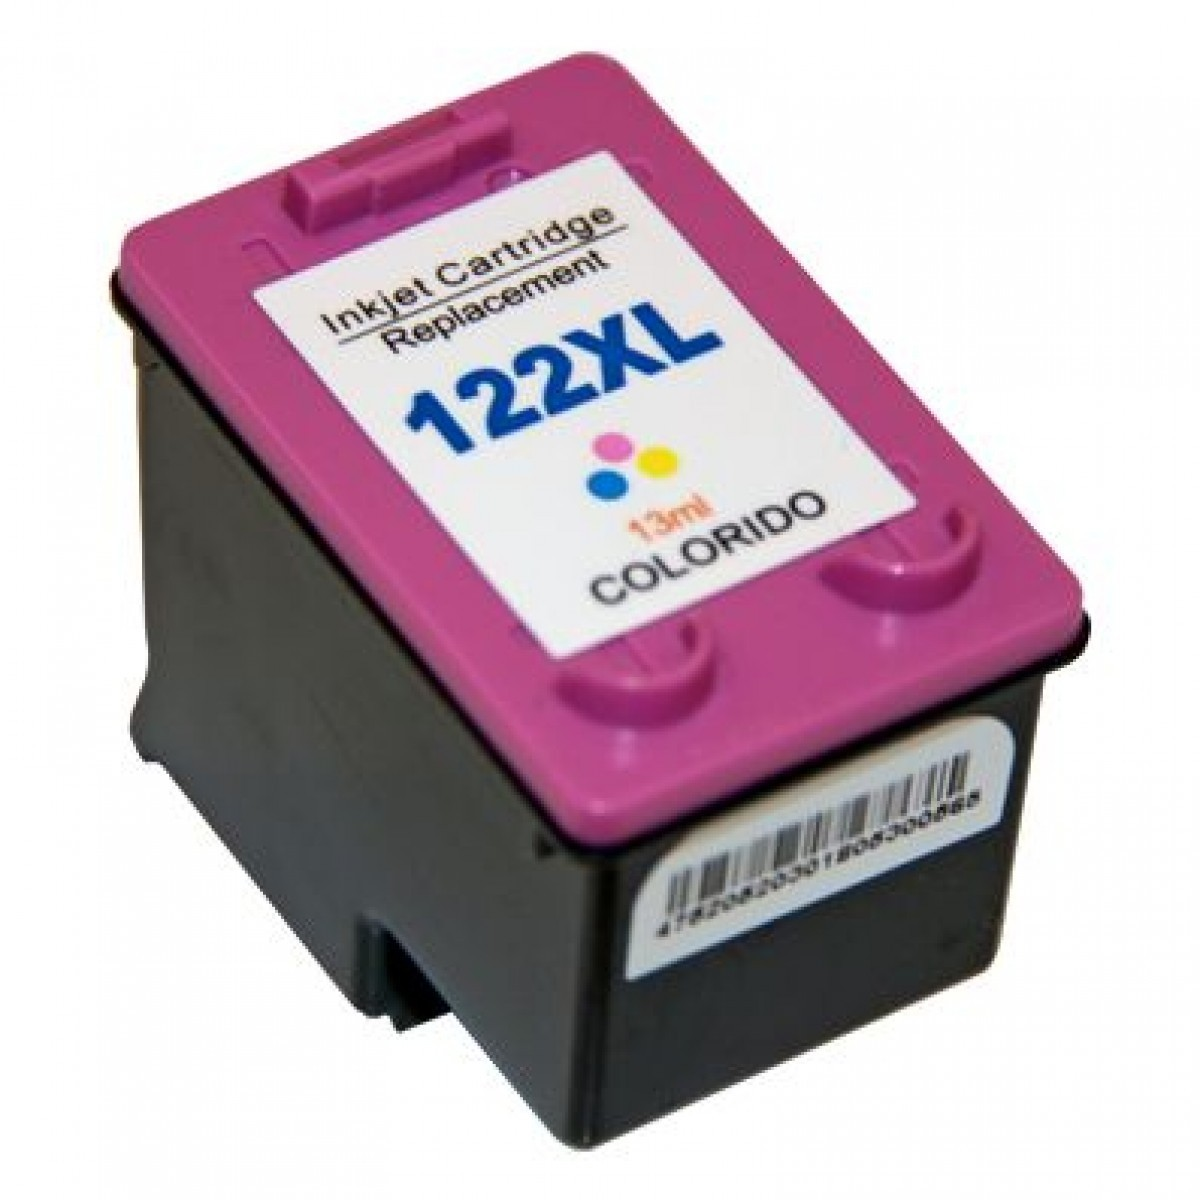 Foto 1 - HP 122XL |Cartucho Compatível| 18ml | Cor: Color | Série 3000